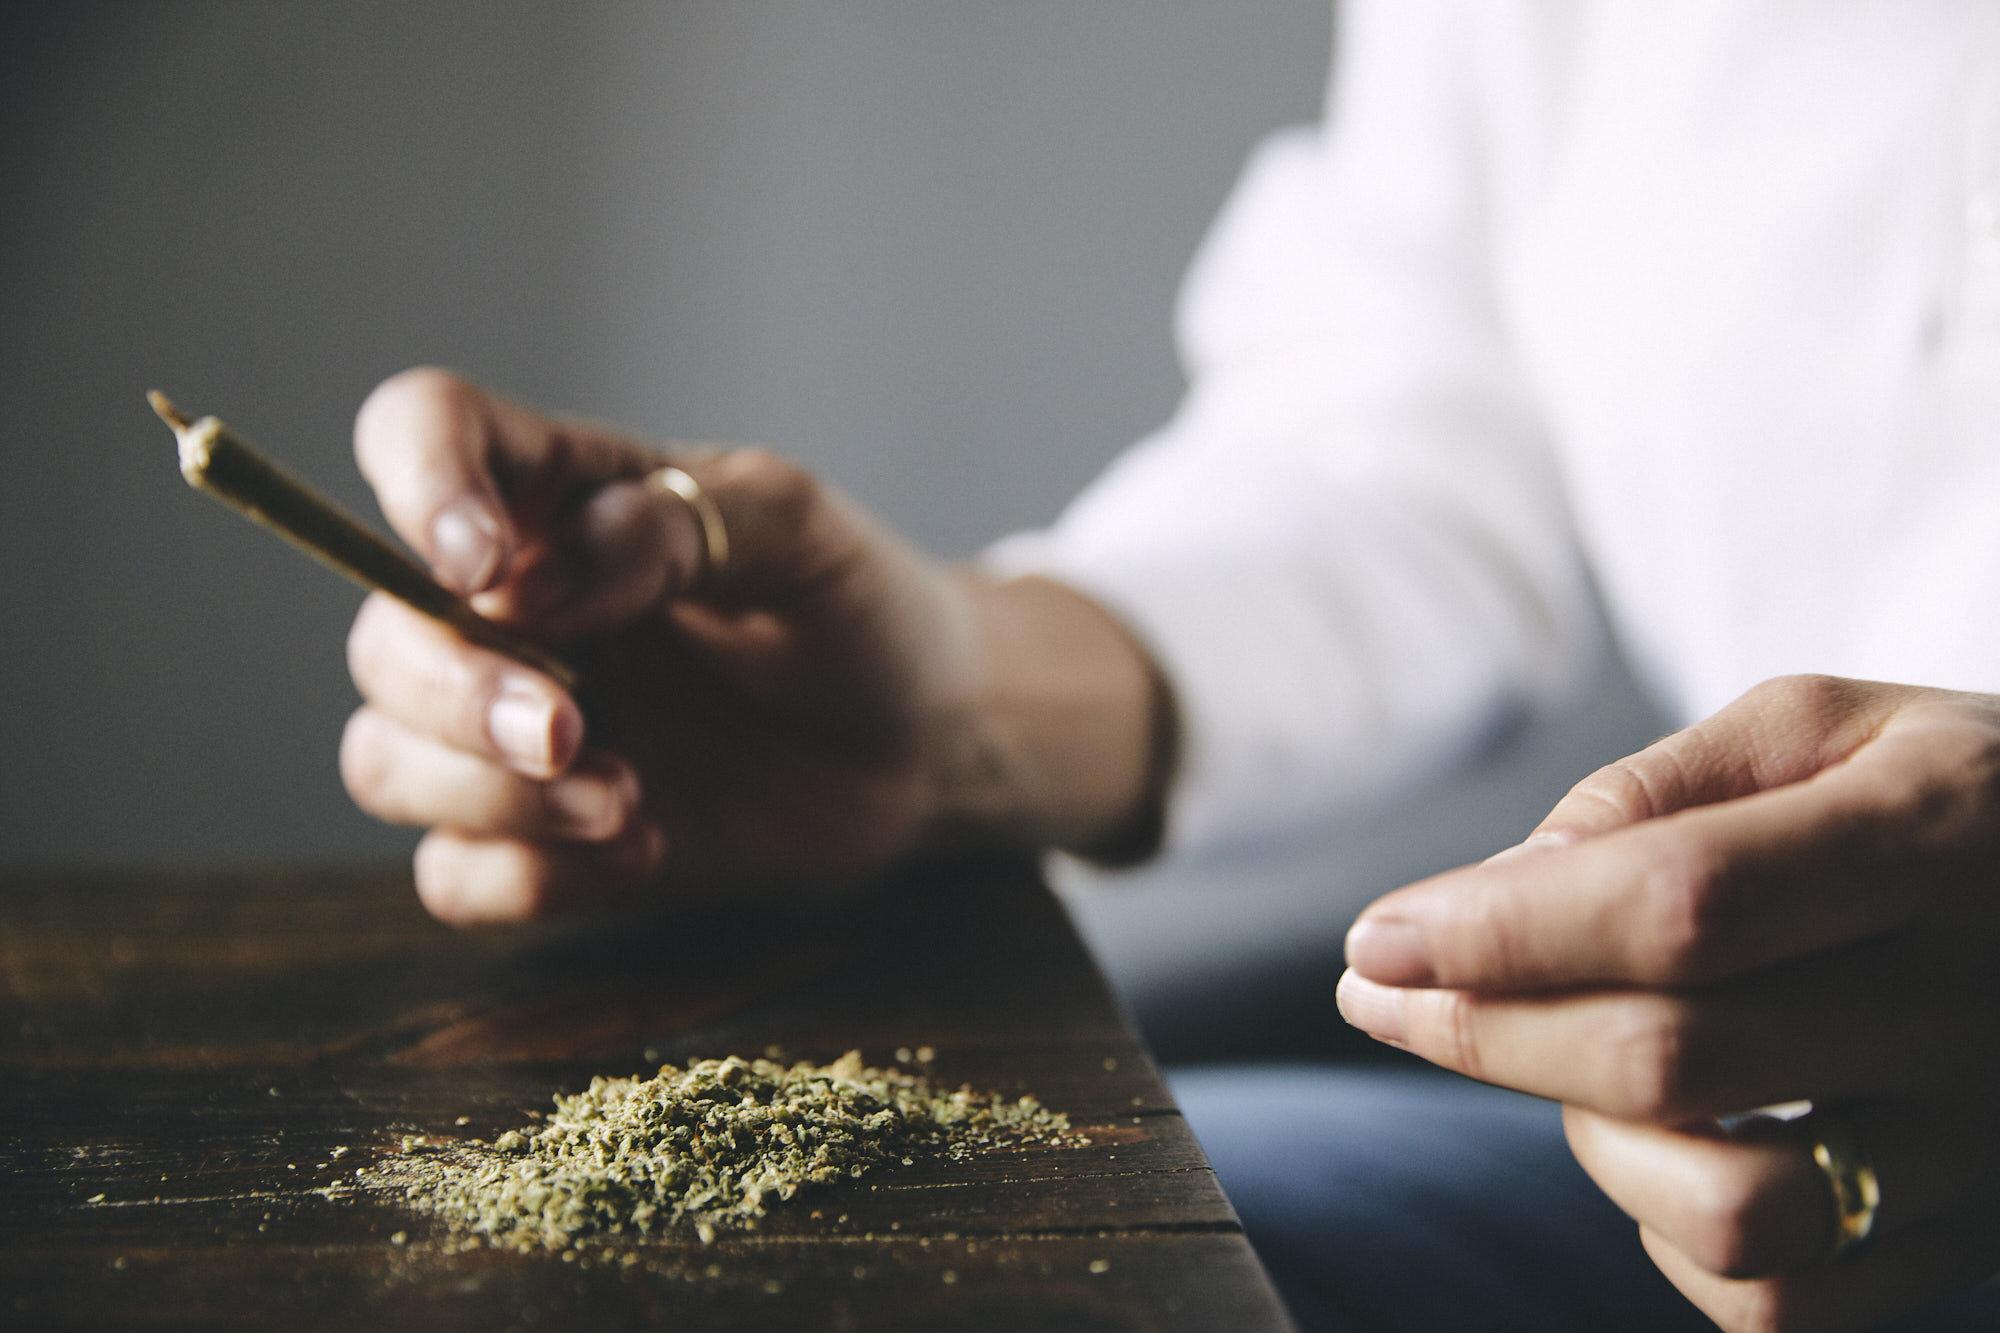 cassandrahope_cannabis2.jpg